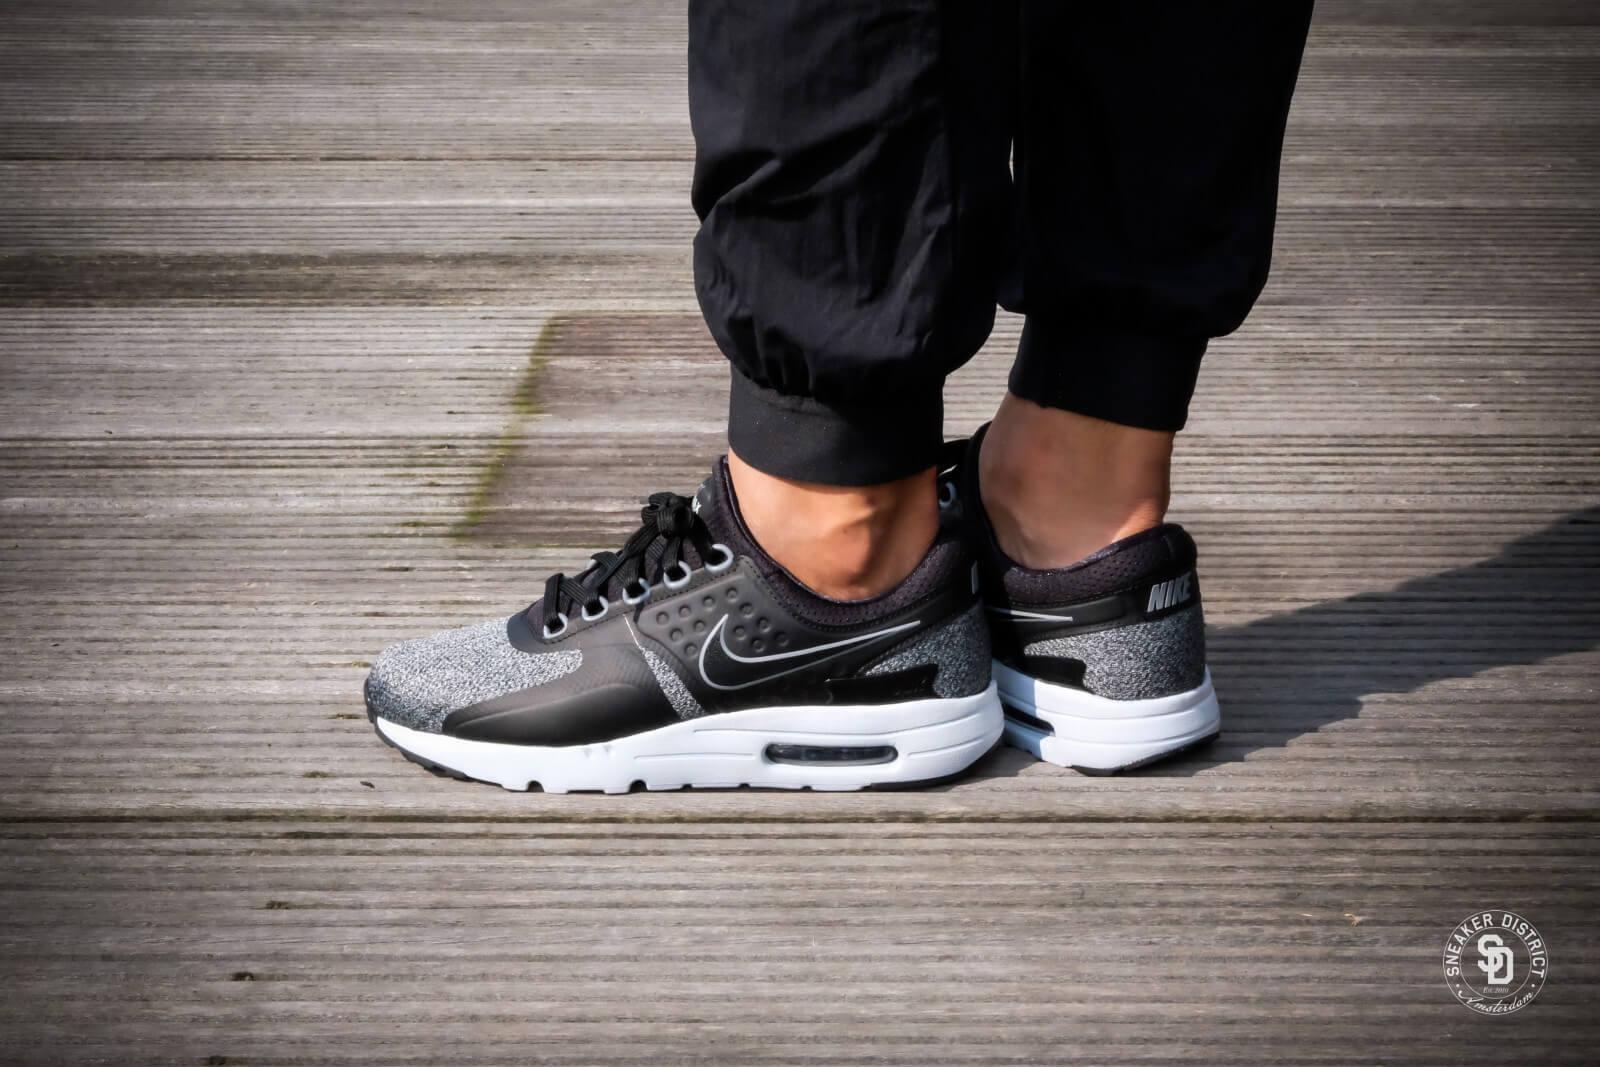 Nike Air Max Zero Essential Black Anthracite Cool Grey 876070 011